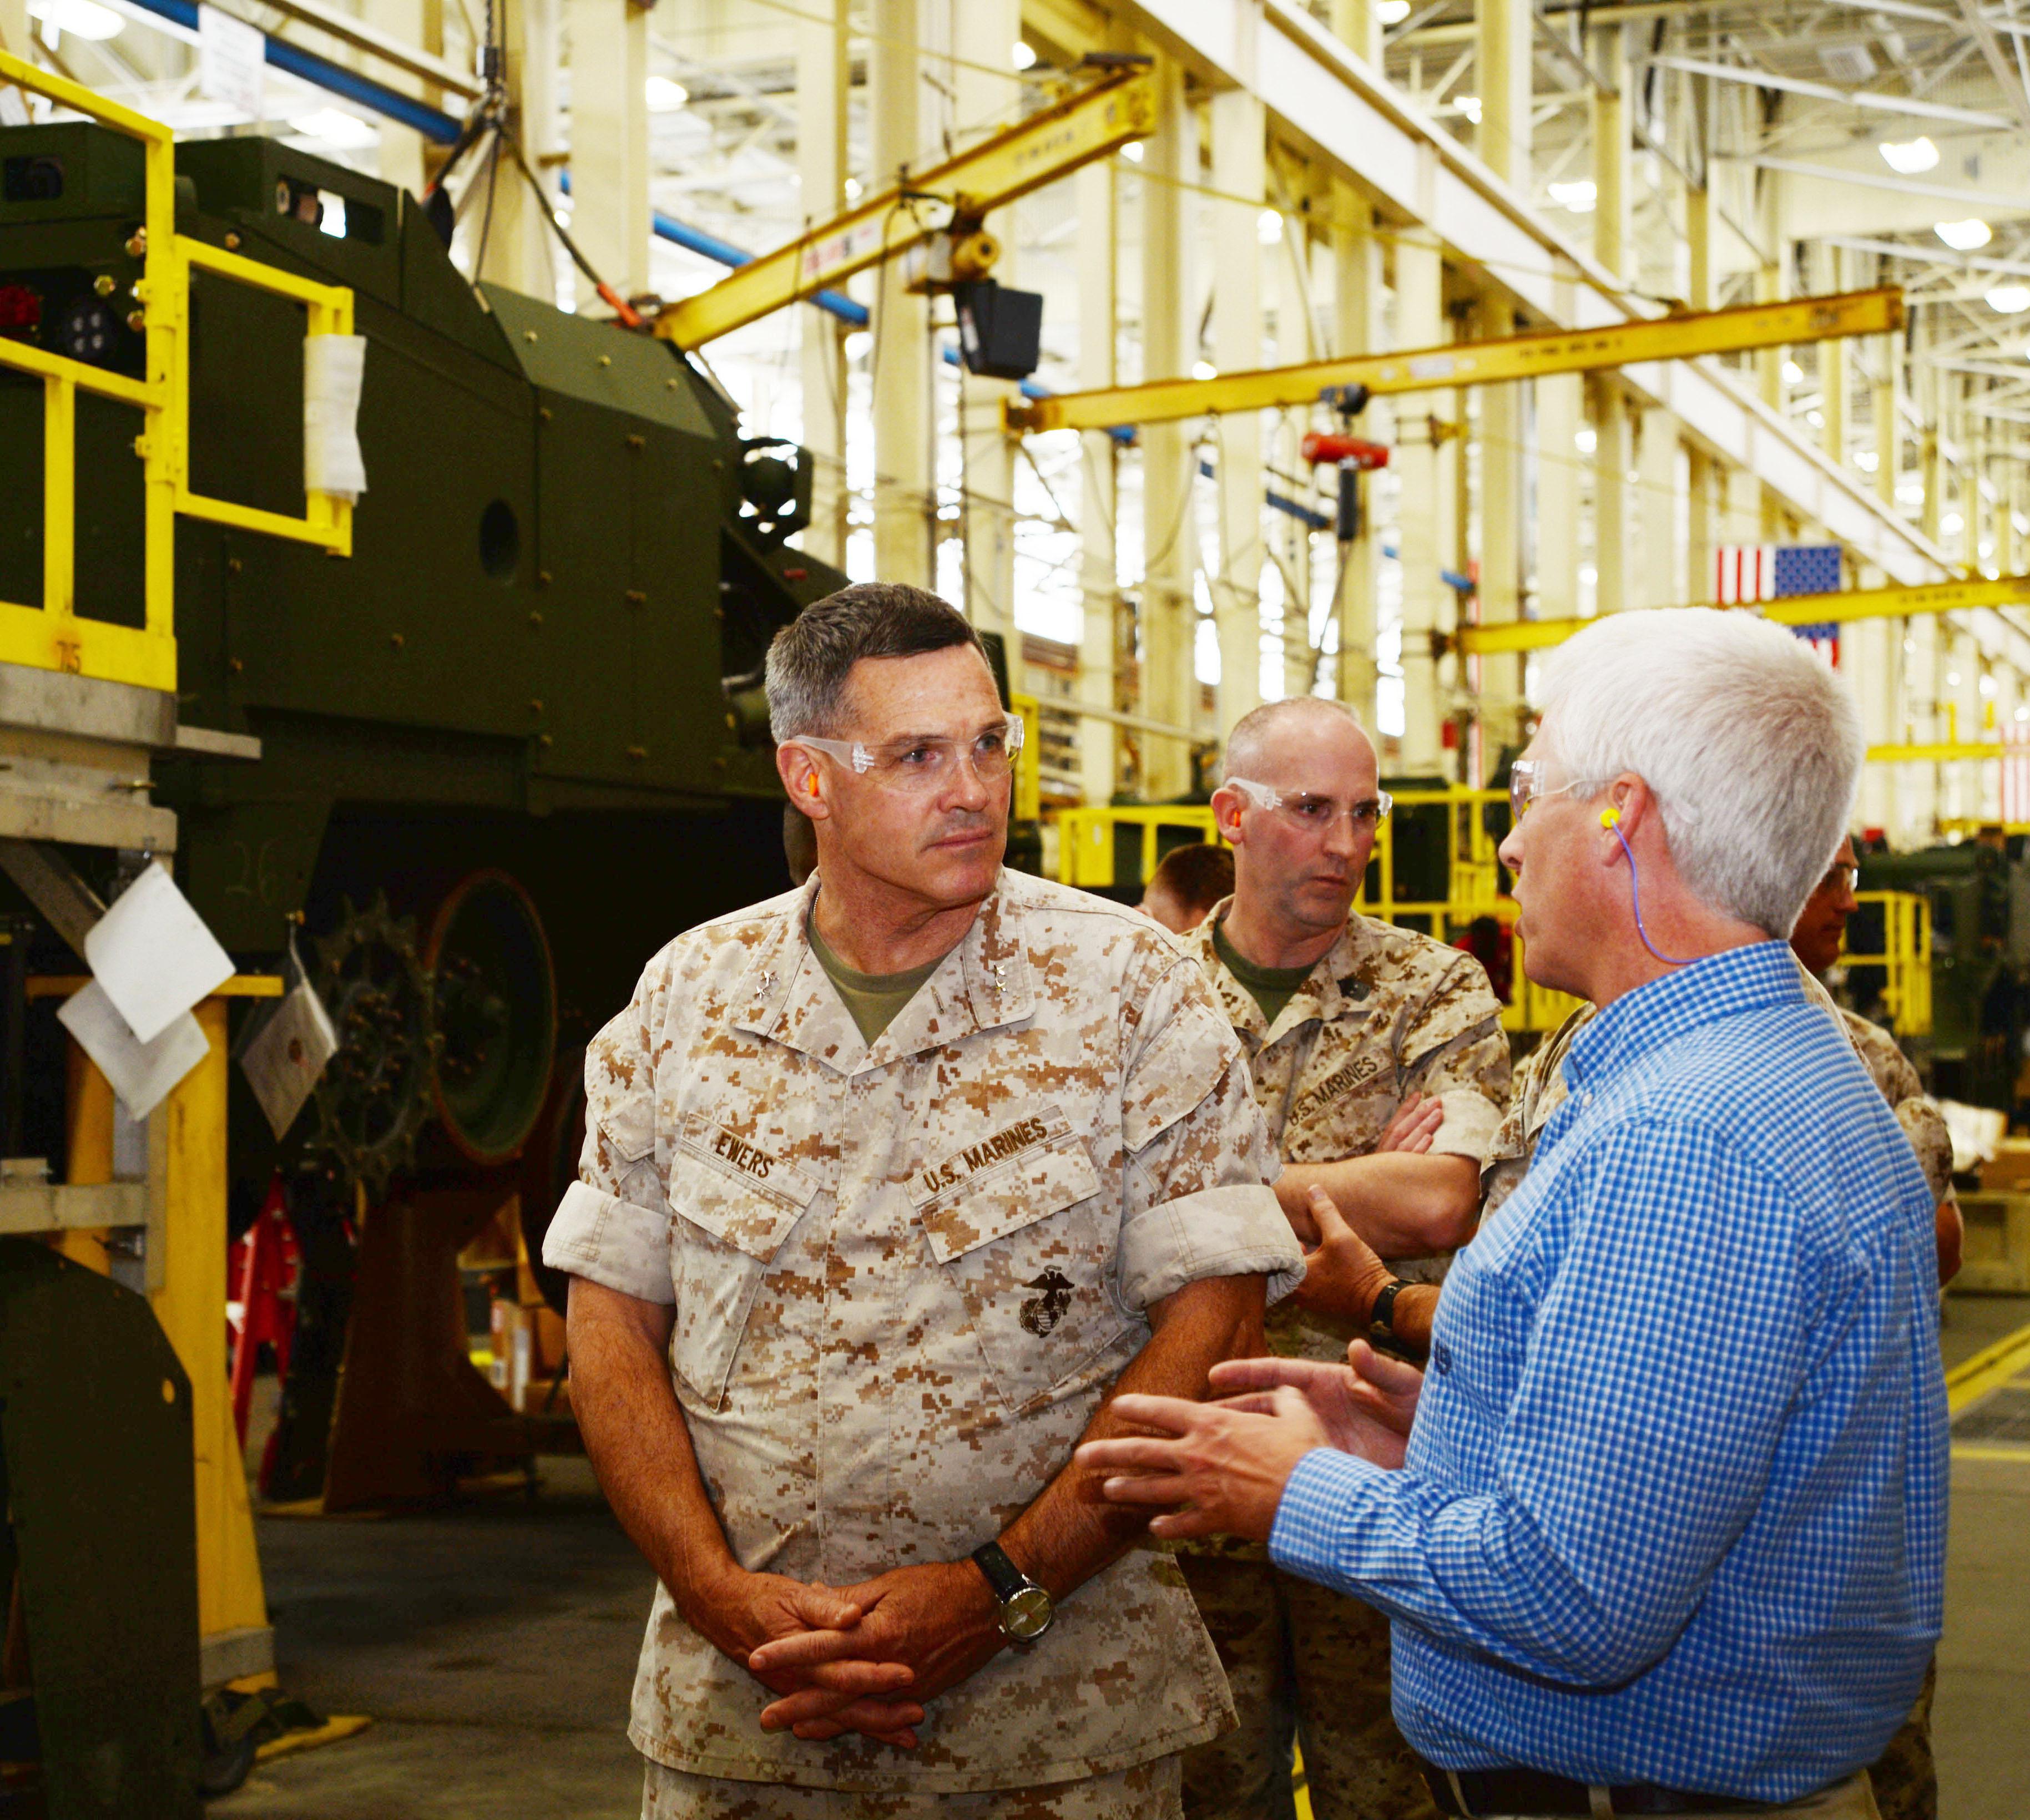 Marine Judge Advocate: Staff Judge Advocate To The Commandant Of The Marine Corps